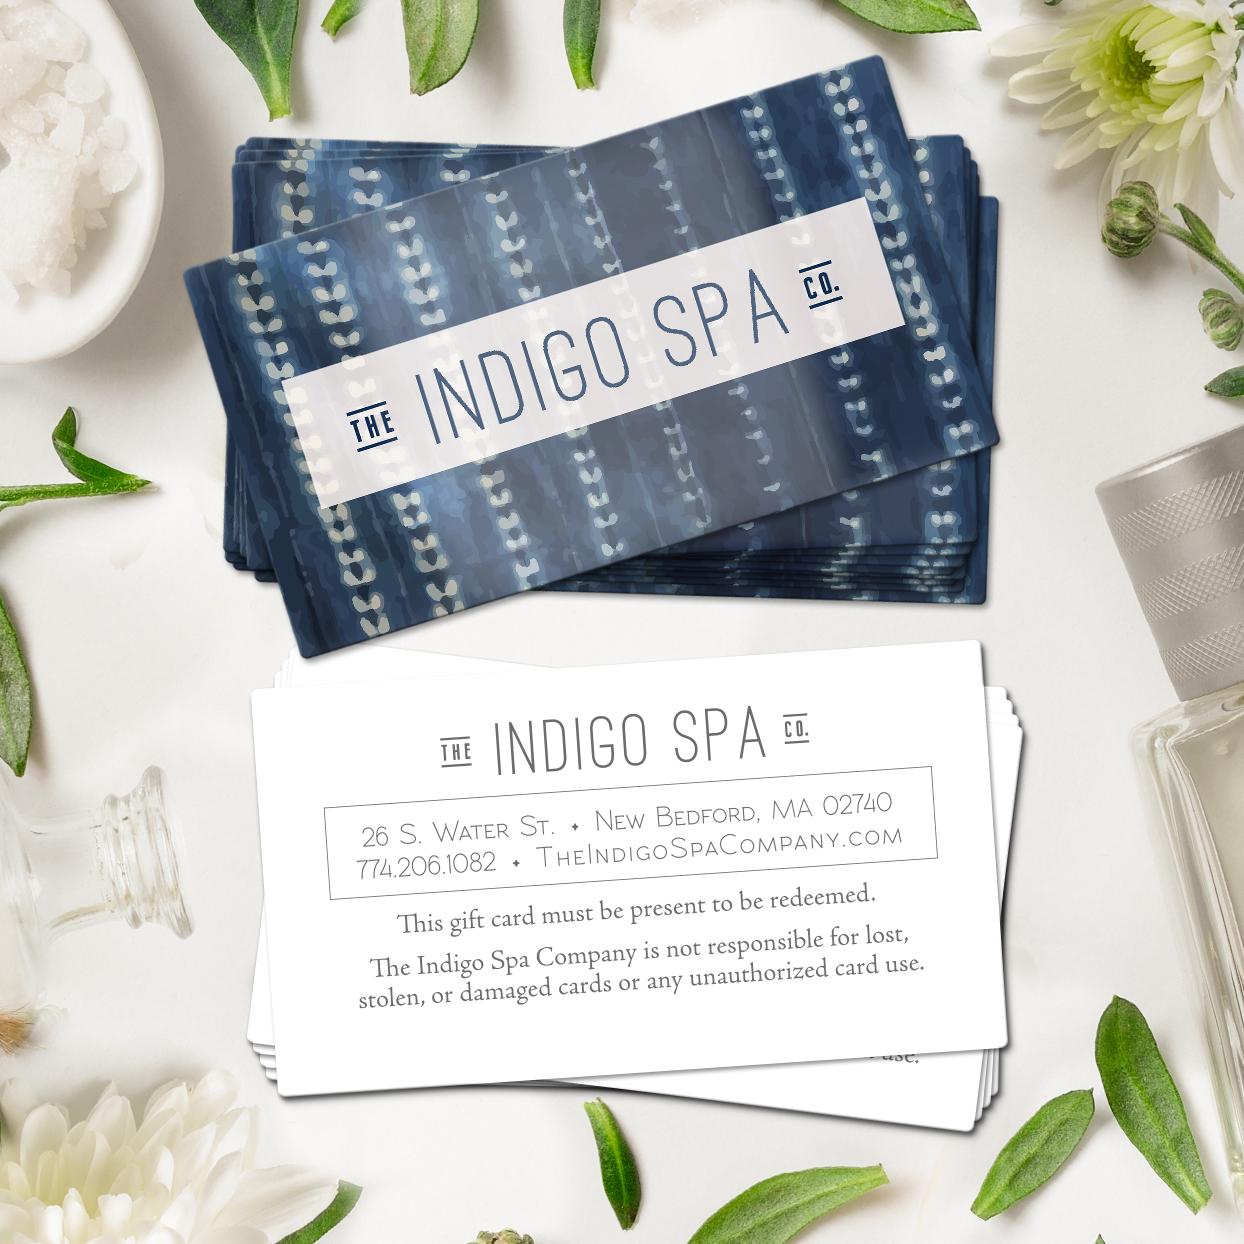 The Indigo Spa Company Gift Cards